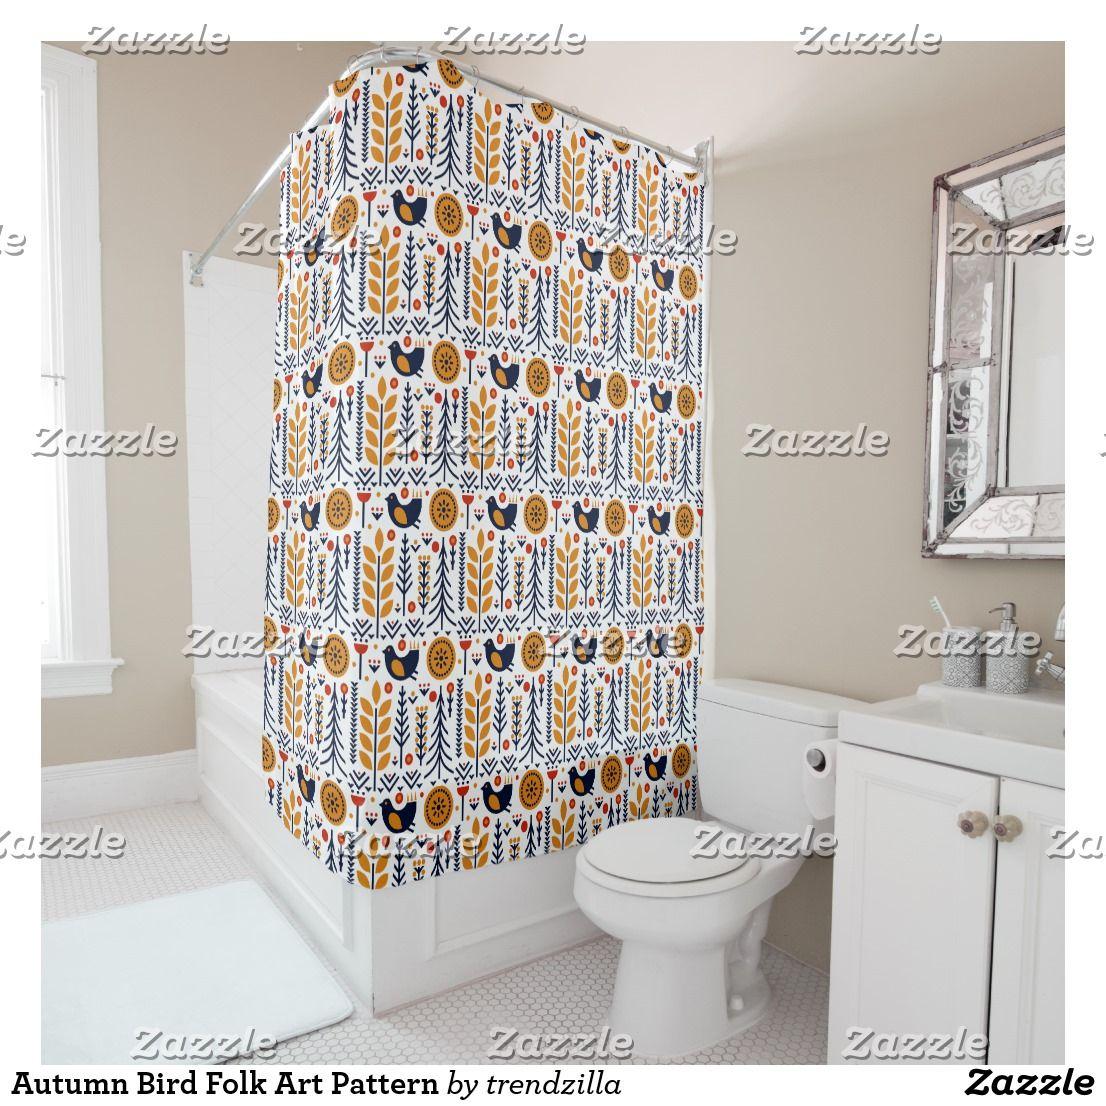 Autumn Bird Folk Art Pattern Shower Curtain Zazzle Com Patterned Shower Curtain Custom Shower Curtains Bathroom Decor Folk art bathroom decor